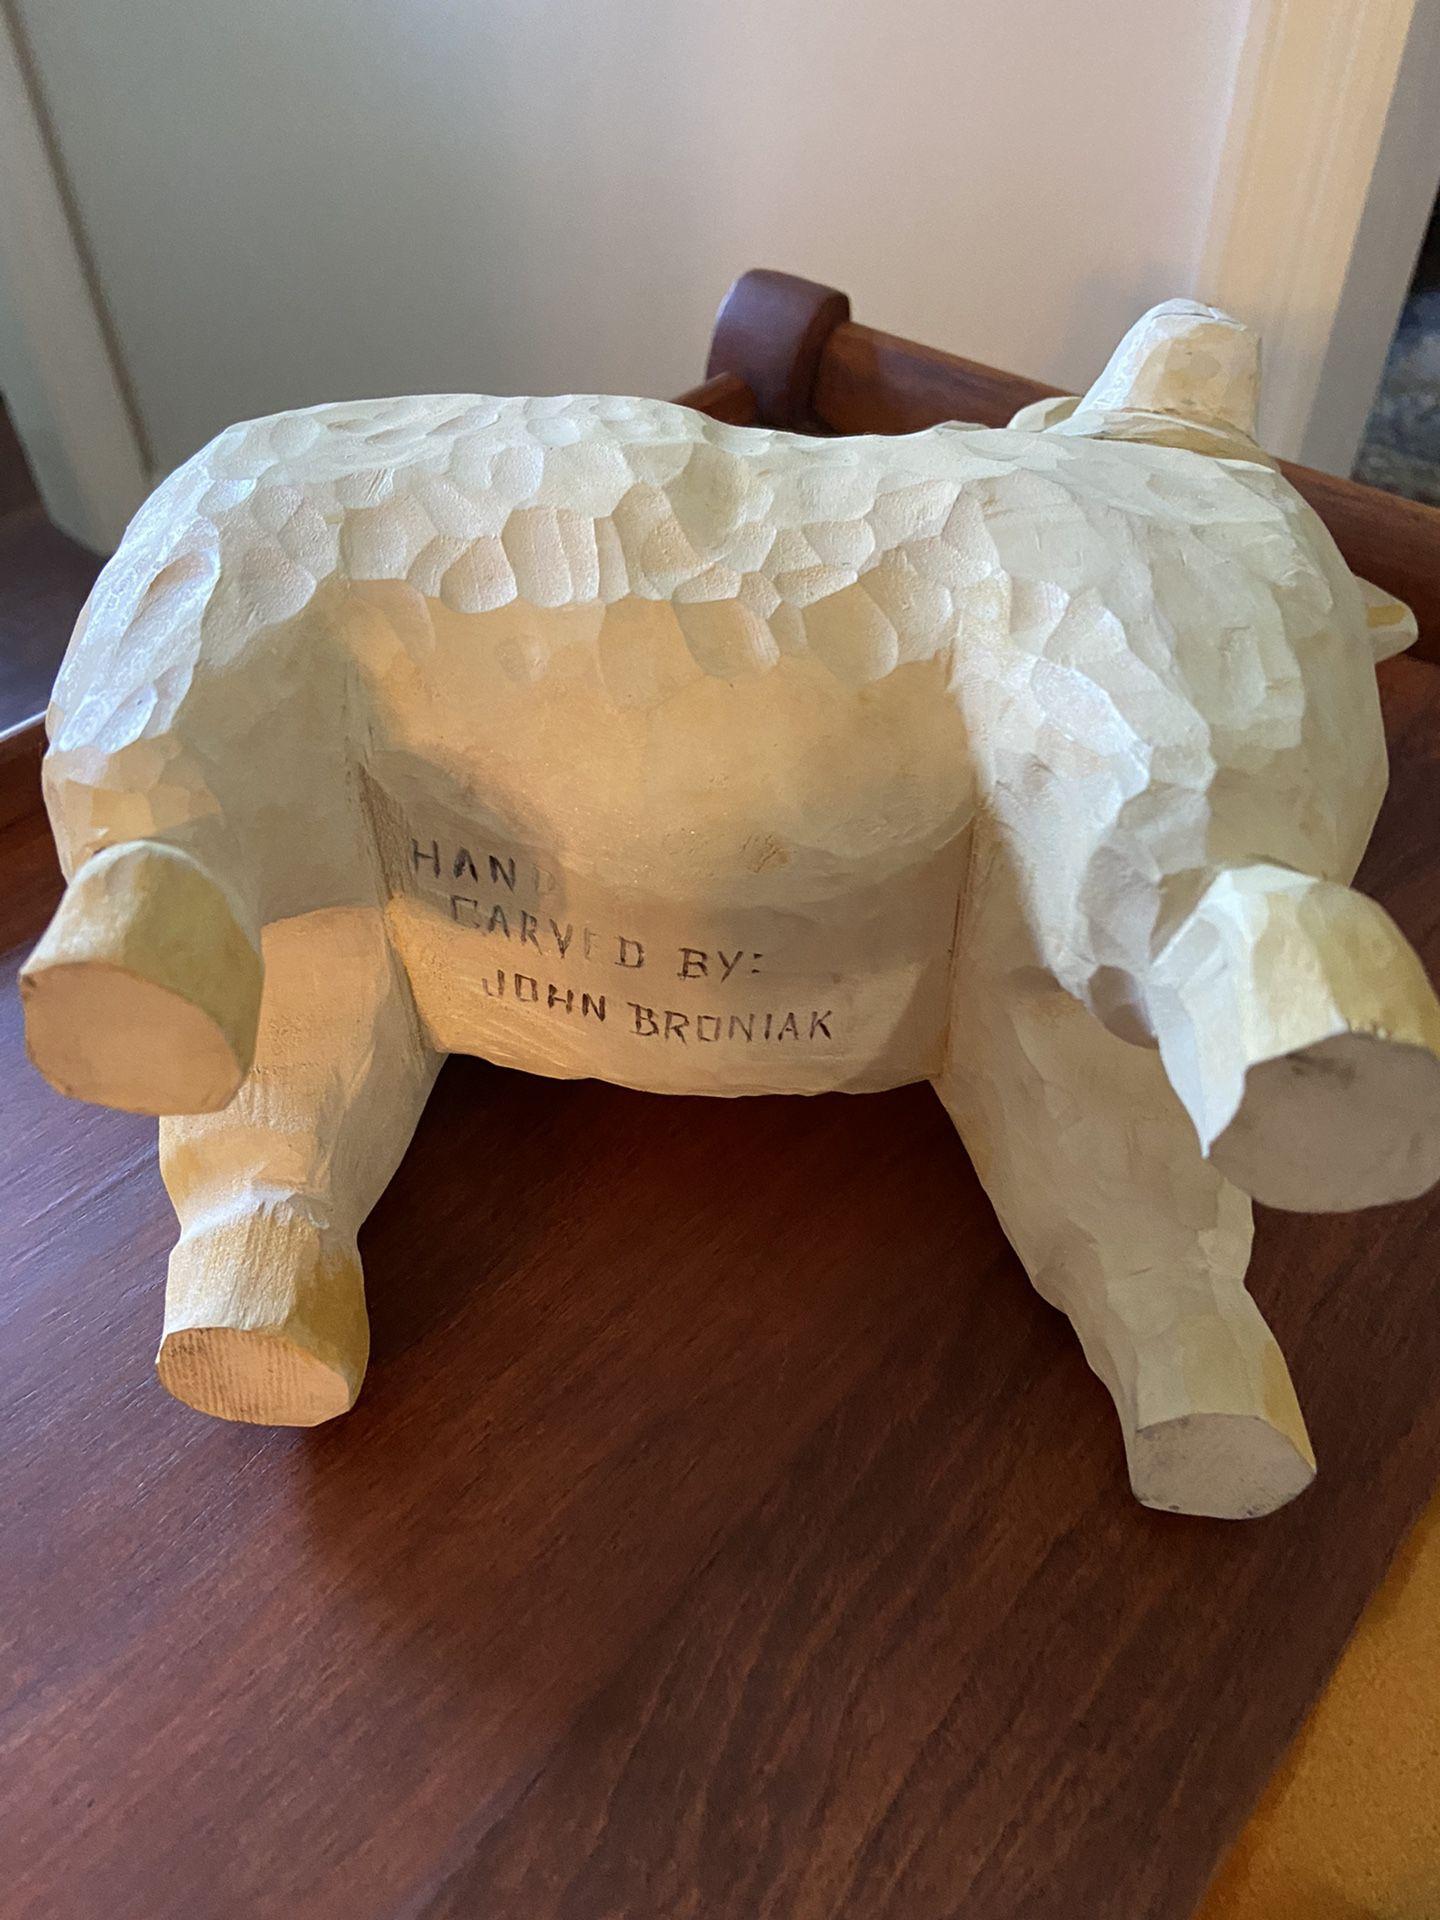 Carved Wooden Sheep By John Brosniak